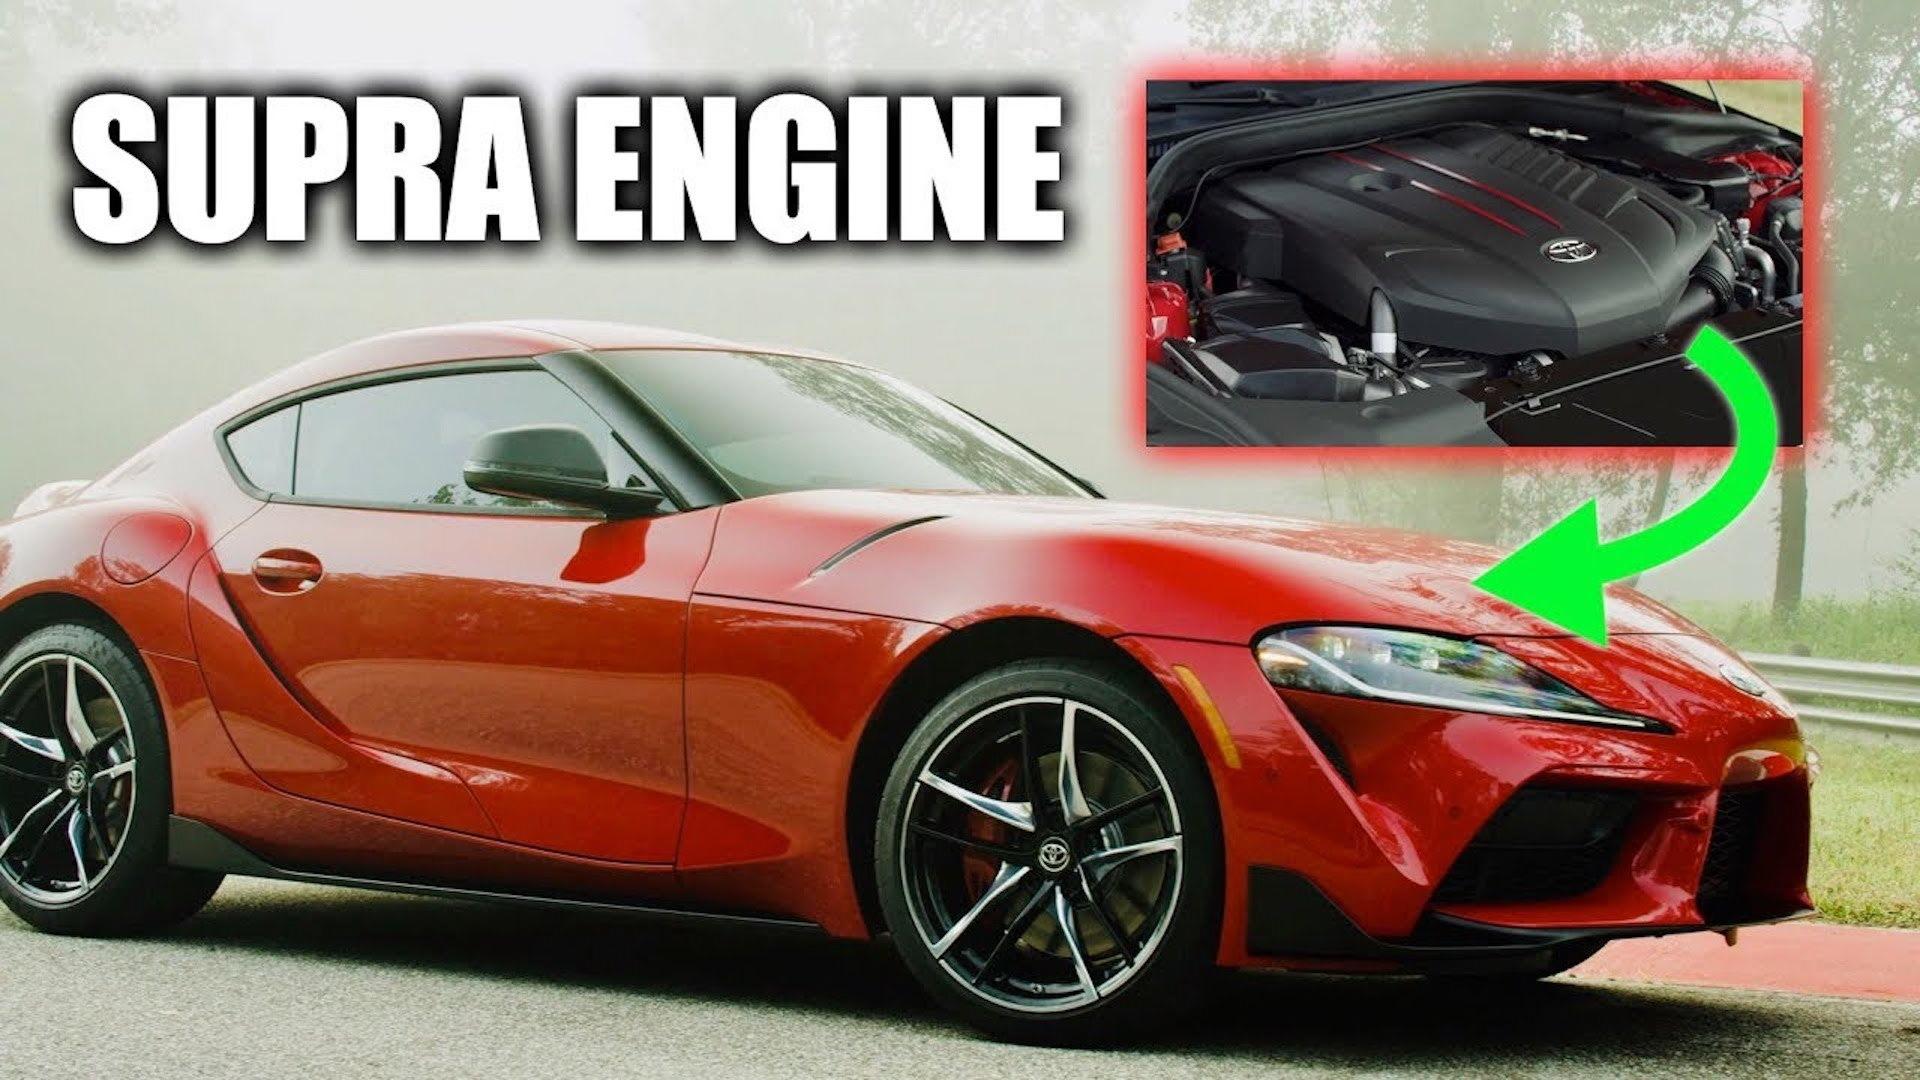 2020 Toyota Supra Engine Code